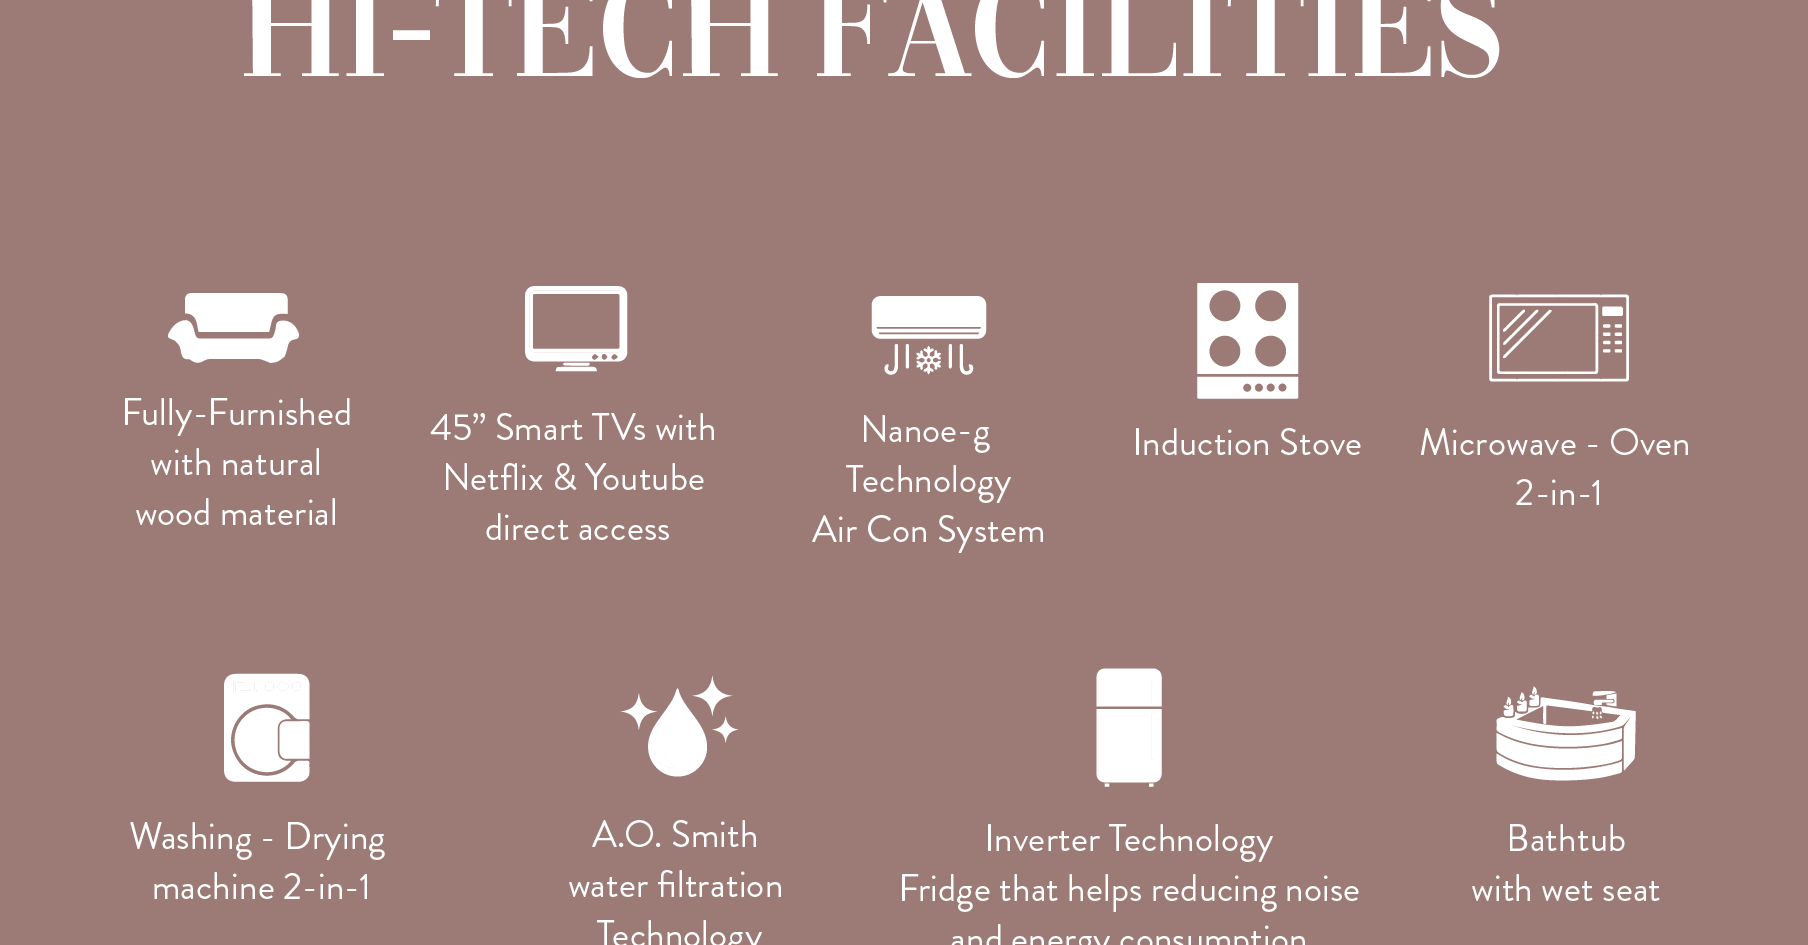 Facilities highlights